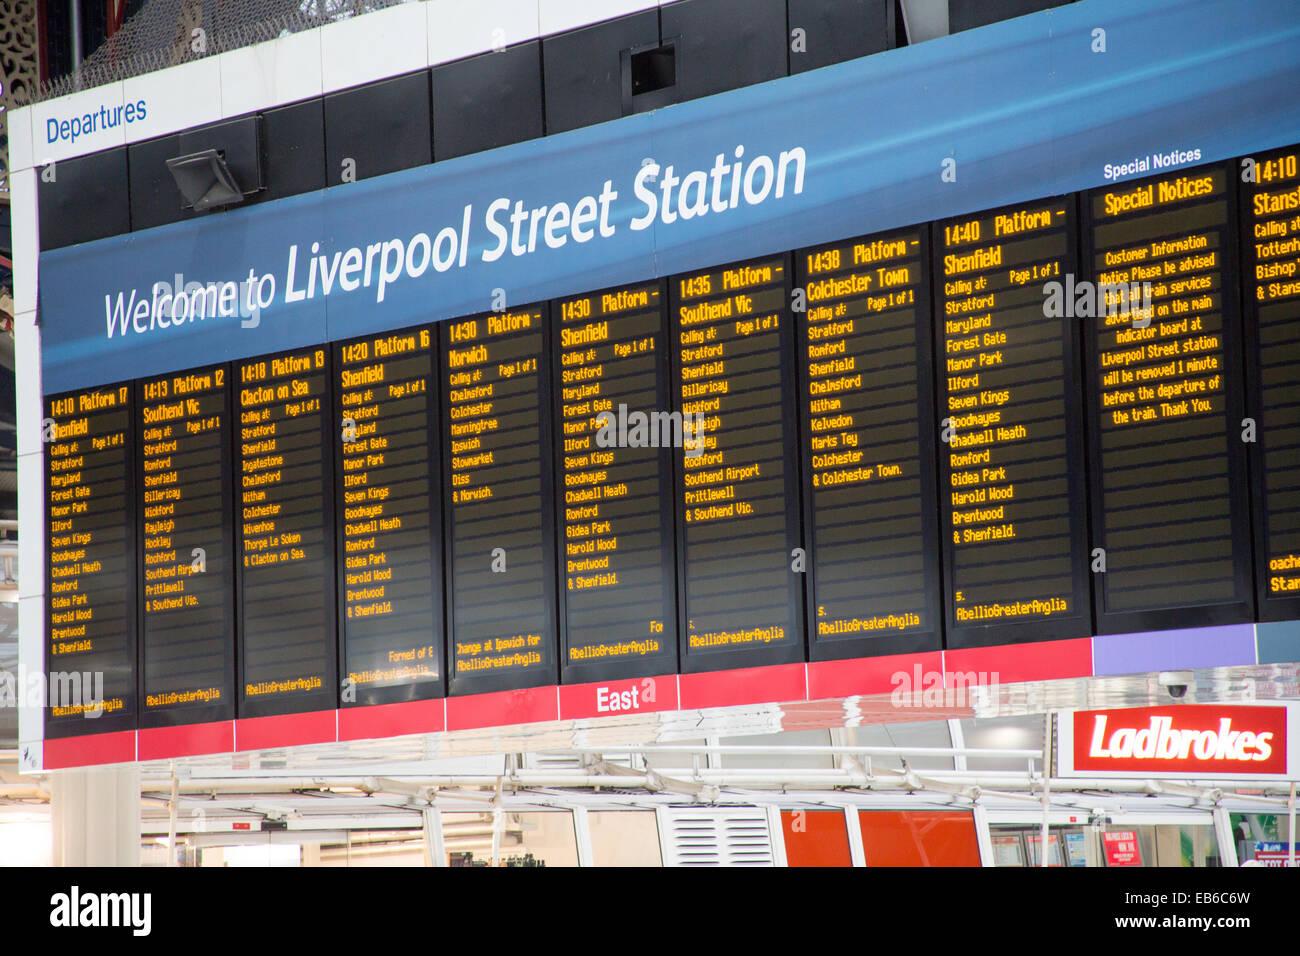 London Liverpool Street Railway Station Departure Board